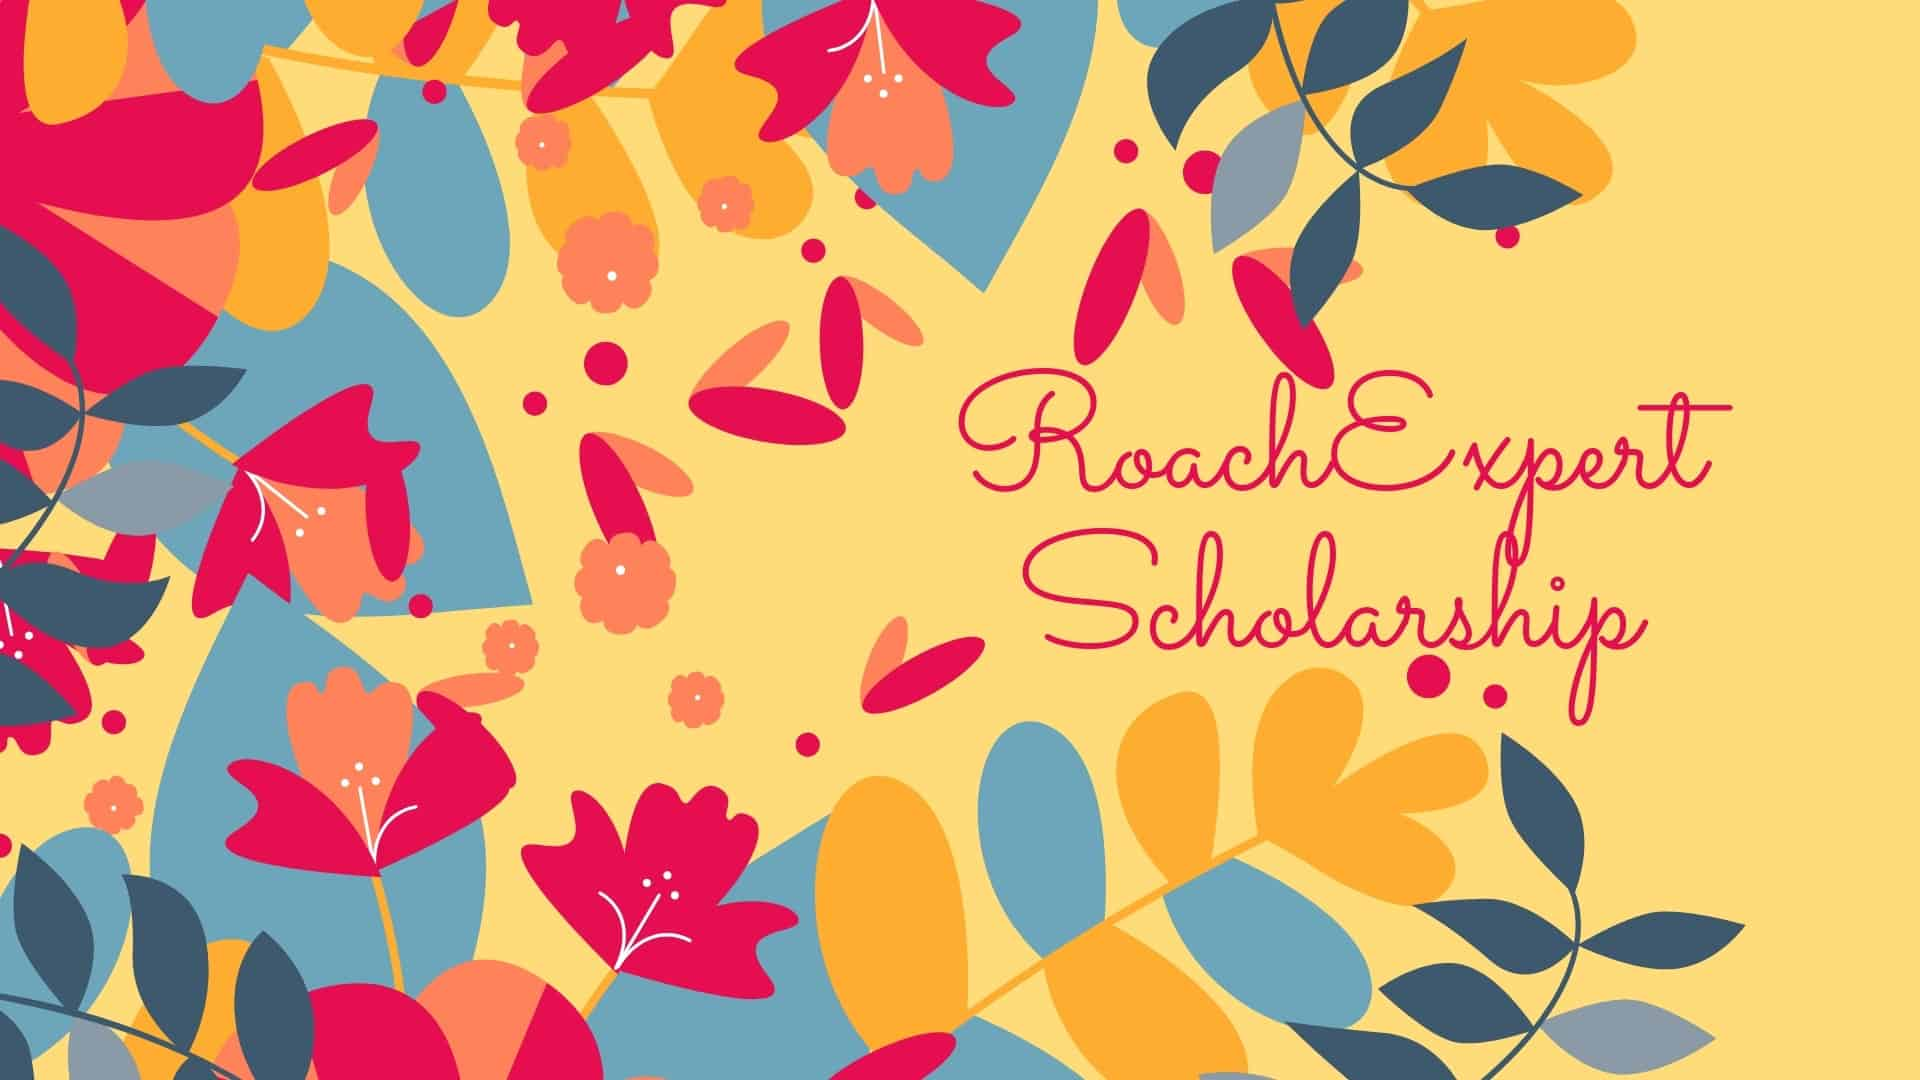 RoachExpert Scholarship